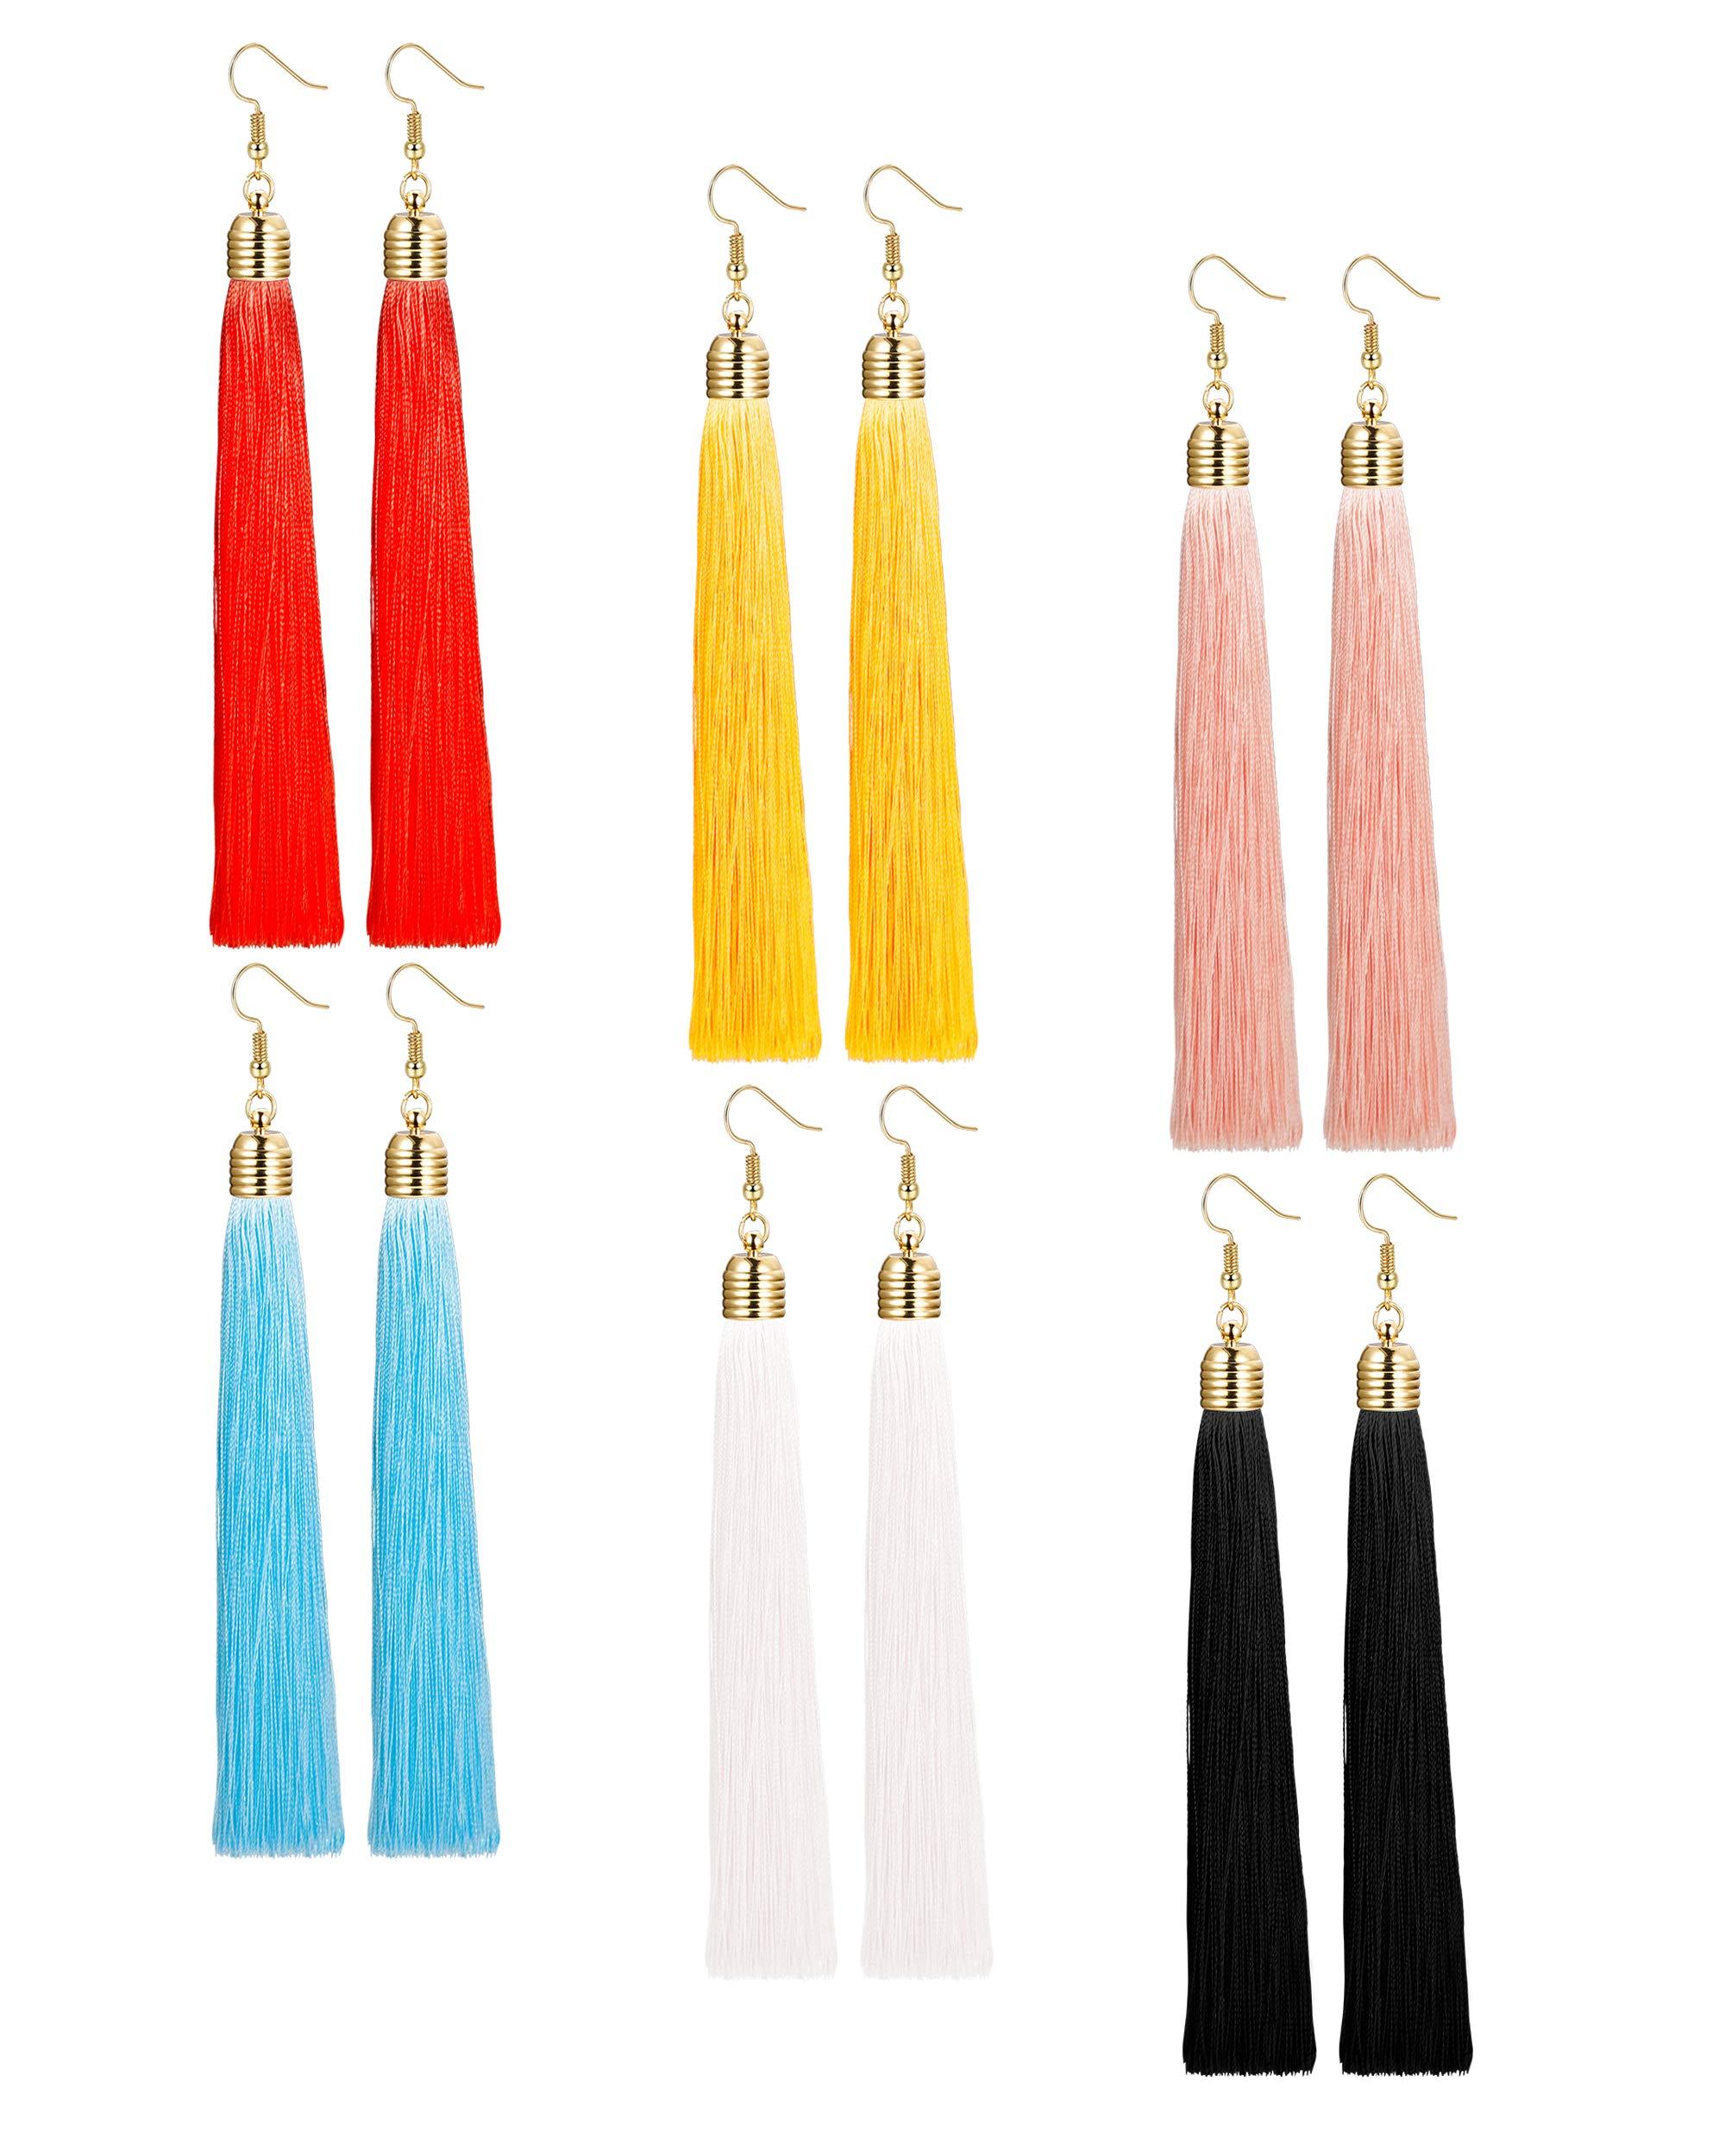 LOYALLOOK 1-3 Pairs Tassel Earrings Set Long Dangle Earrings for Women Black/Blue/Red Tassel (6 Pairs)